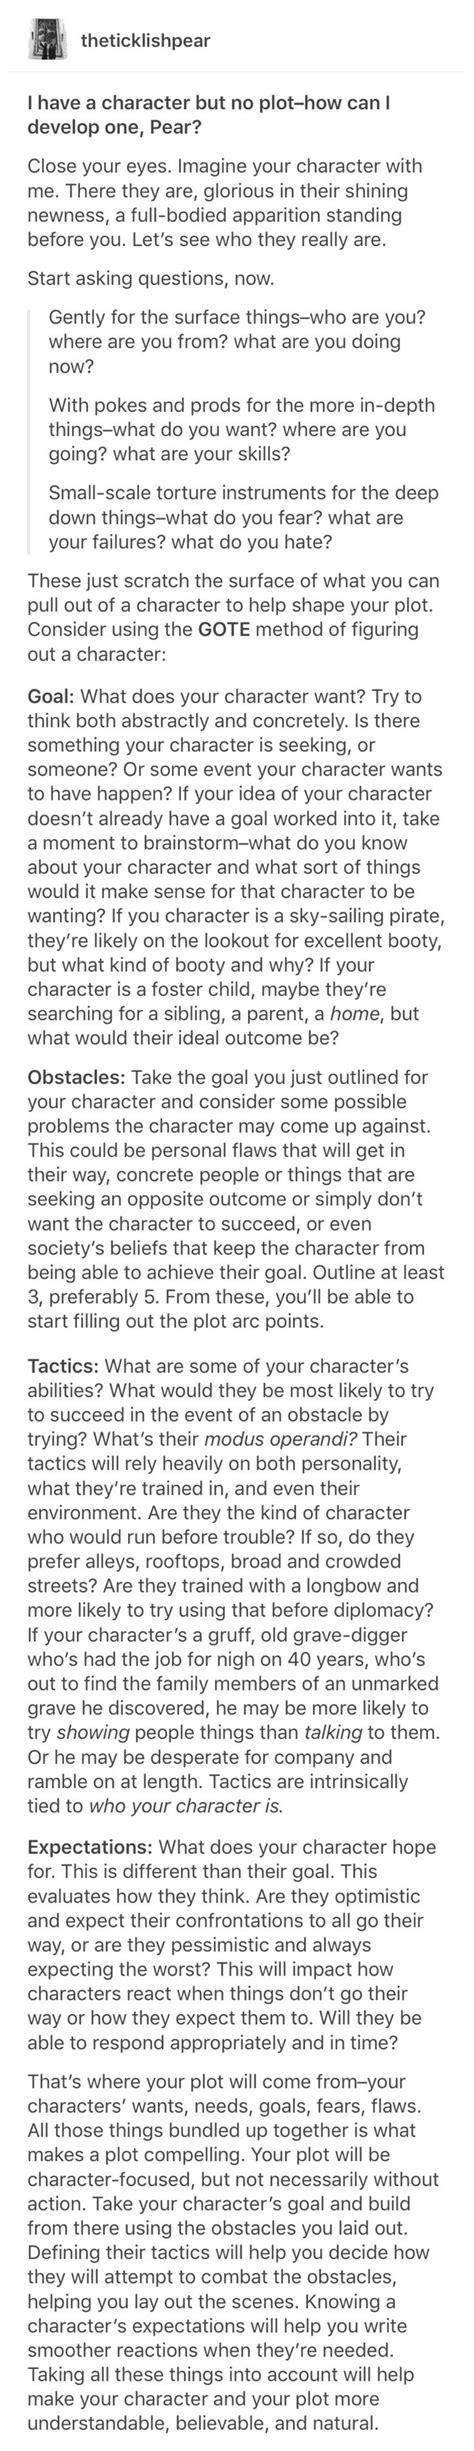 gote method  character design writing writing tips